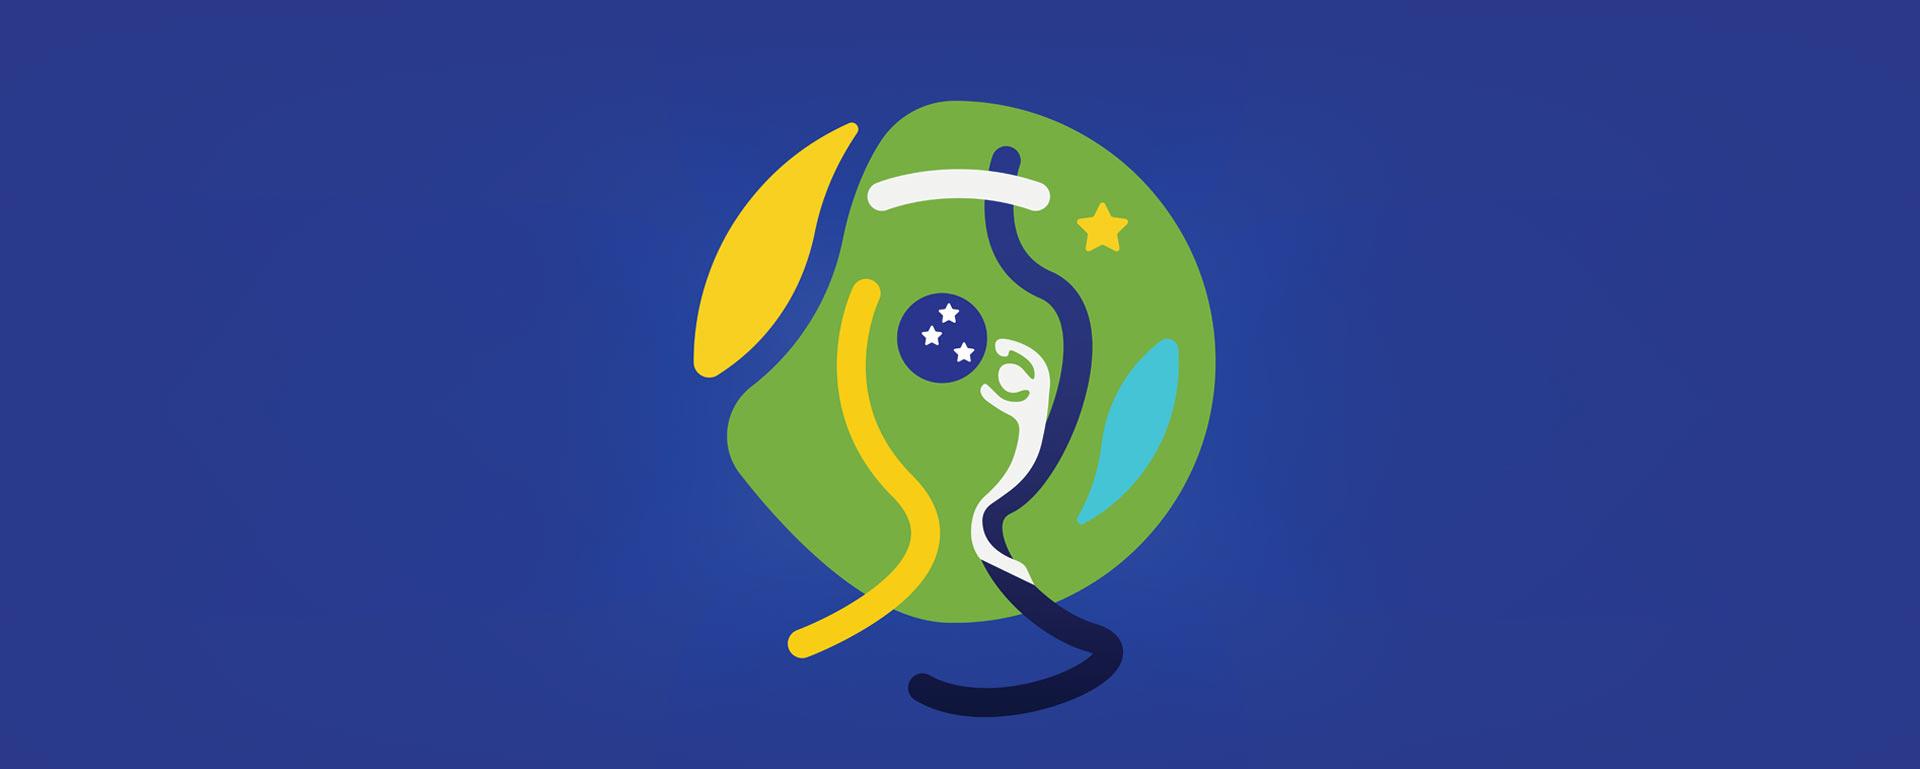 Copa America w cieniu koronawirusa.